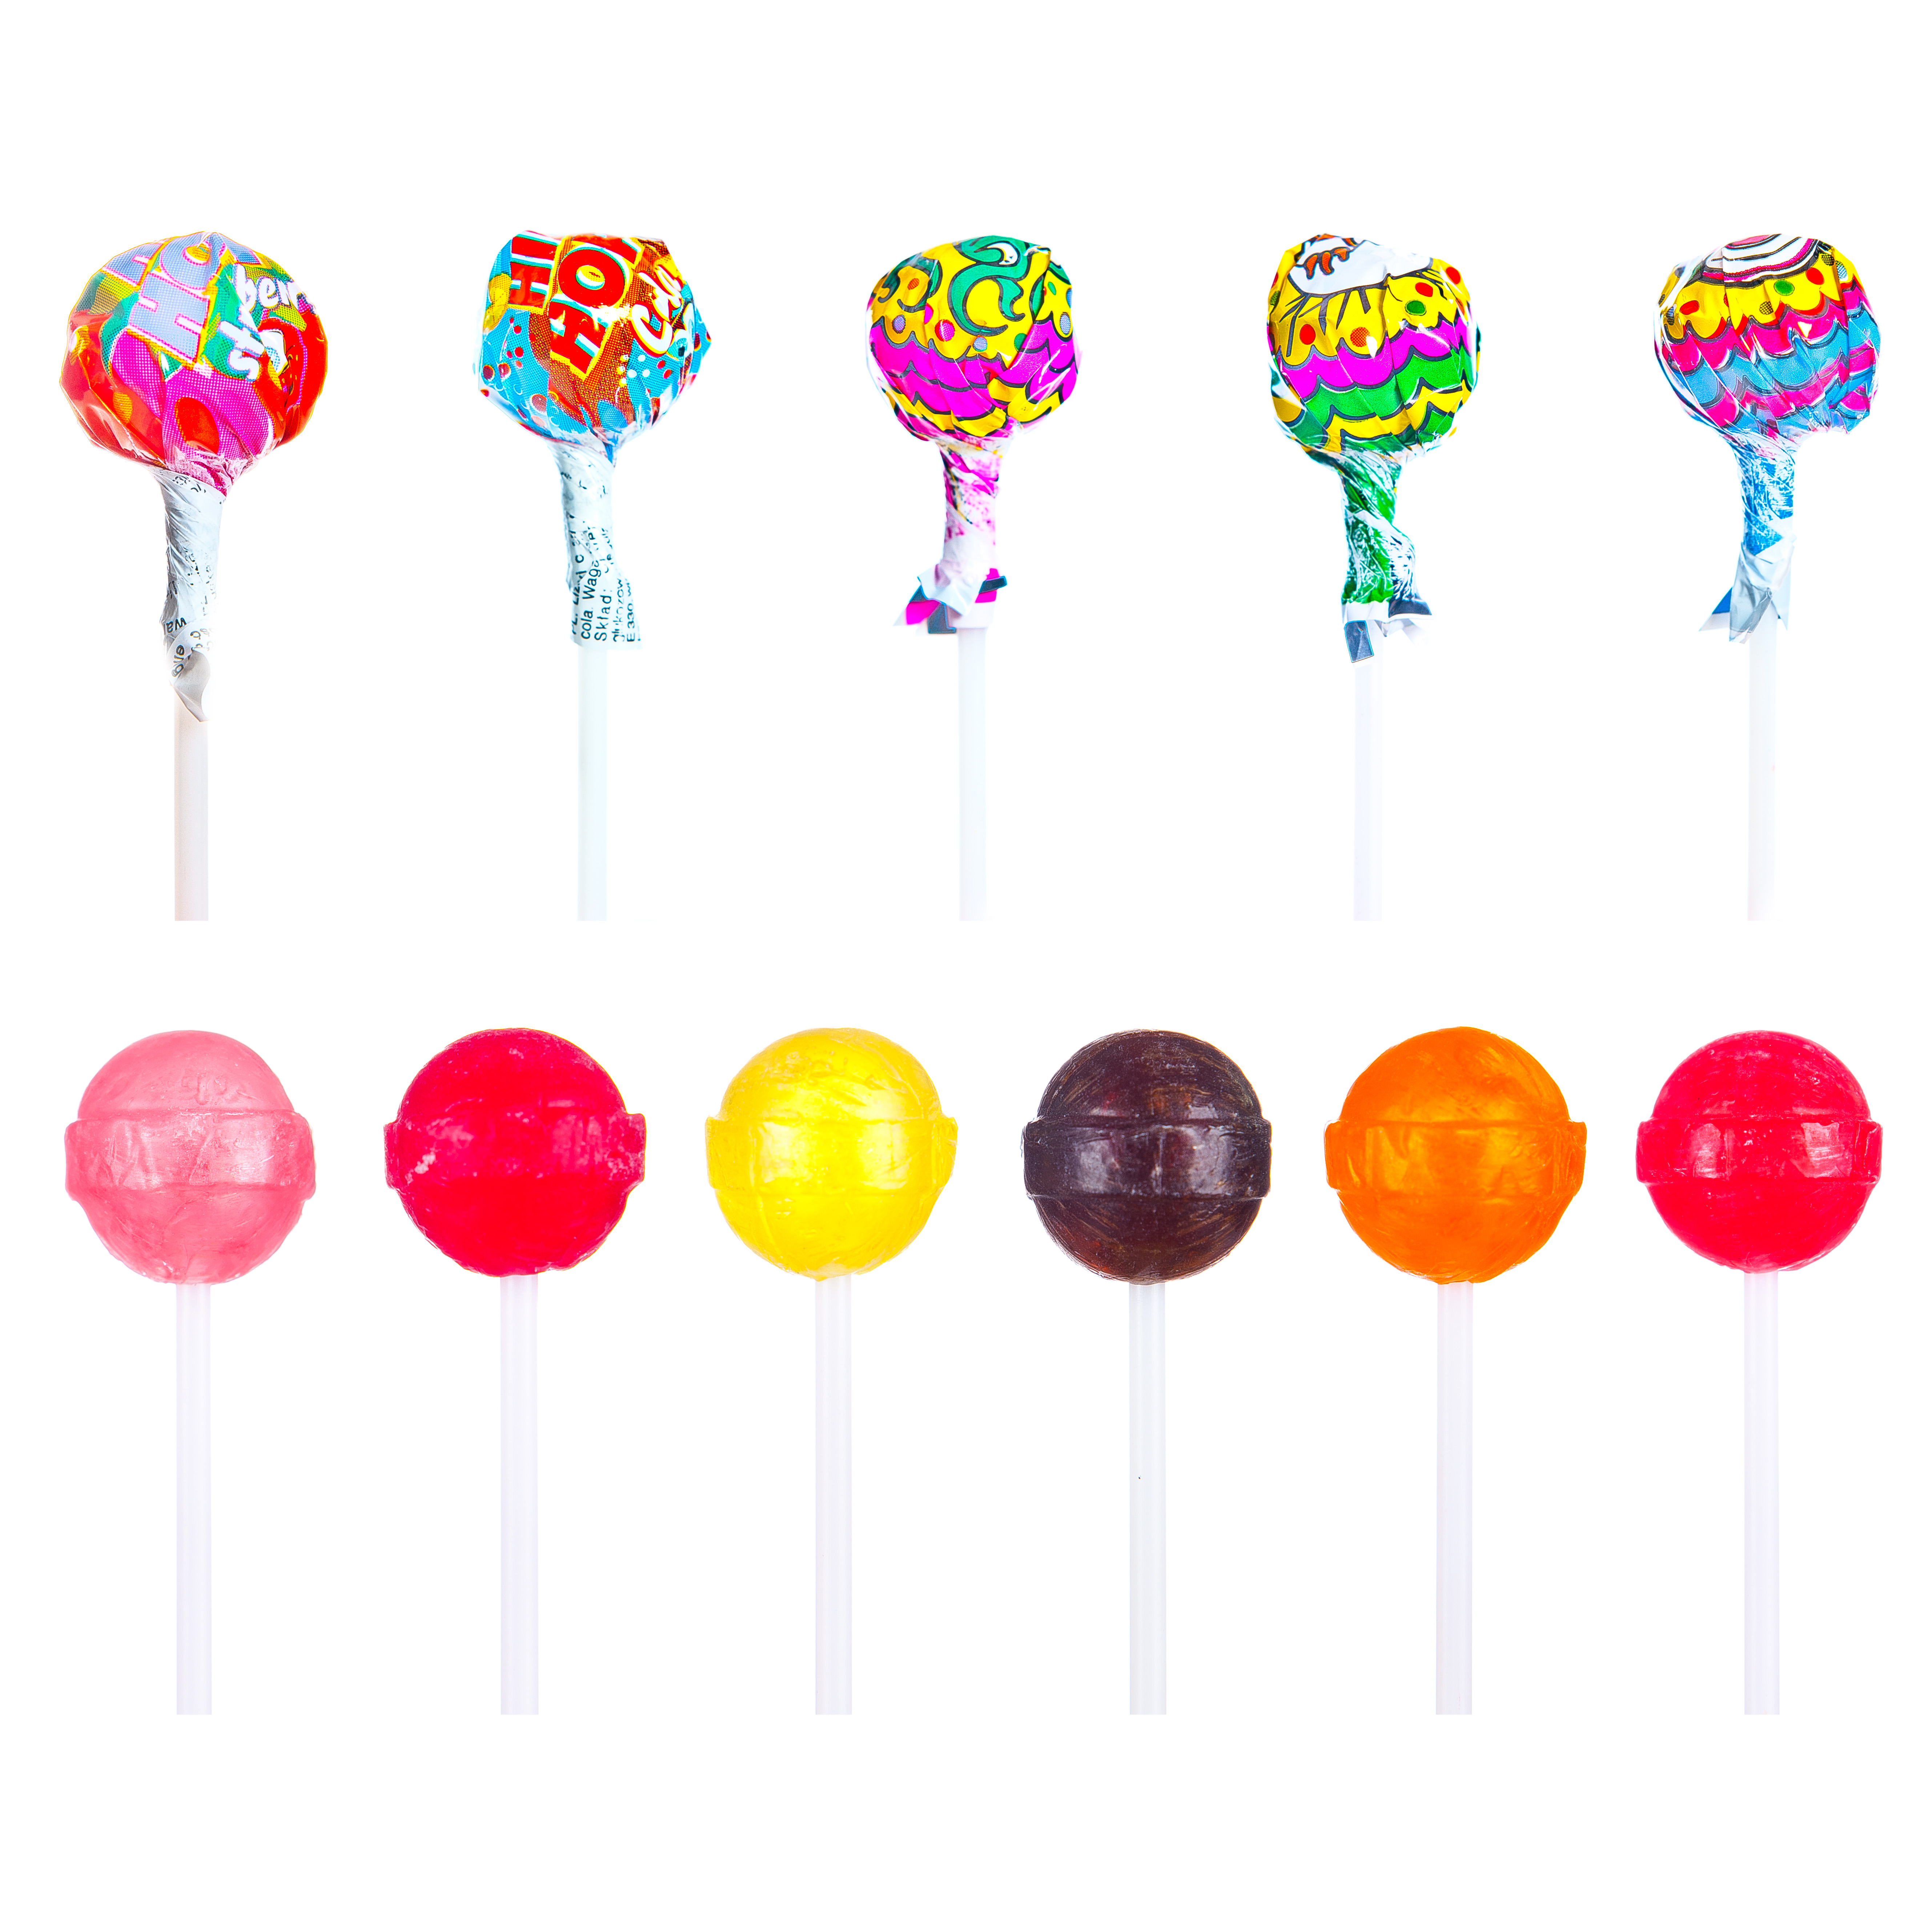 5315x5315 8g, 10g Ball Lollipop Karwit